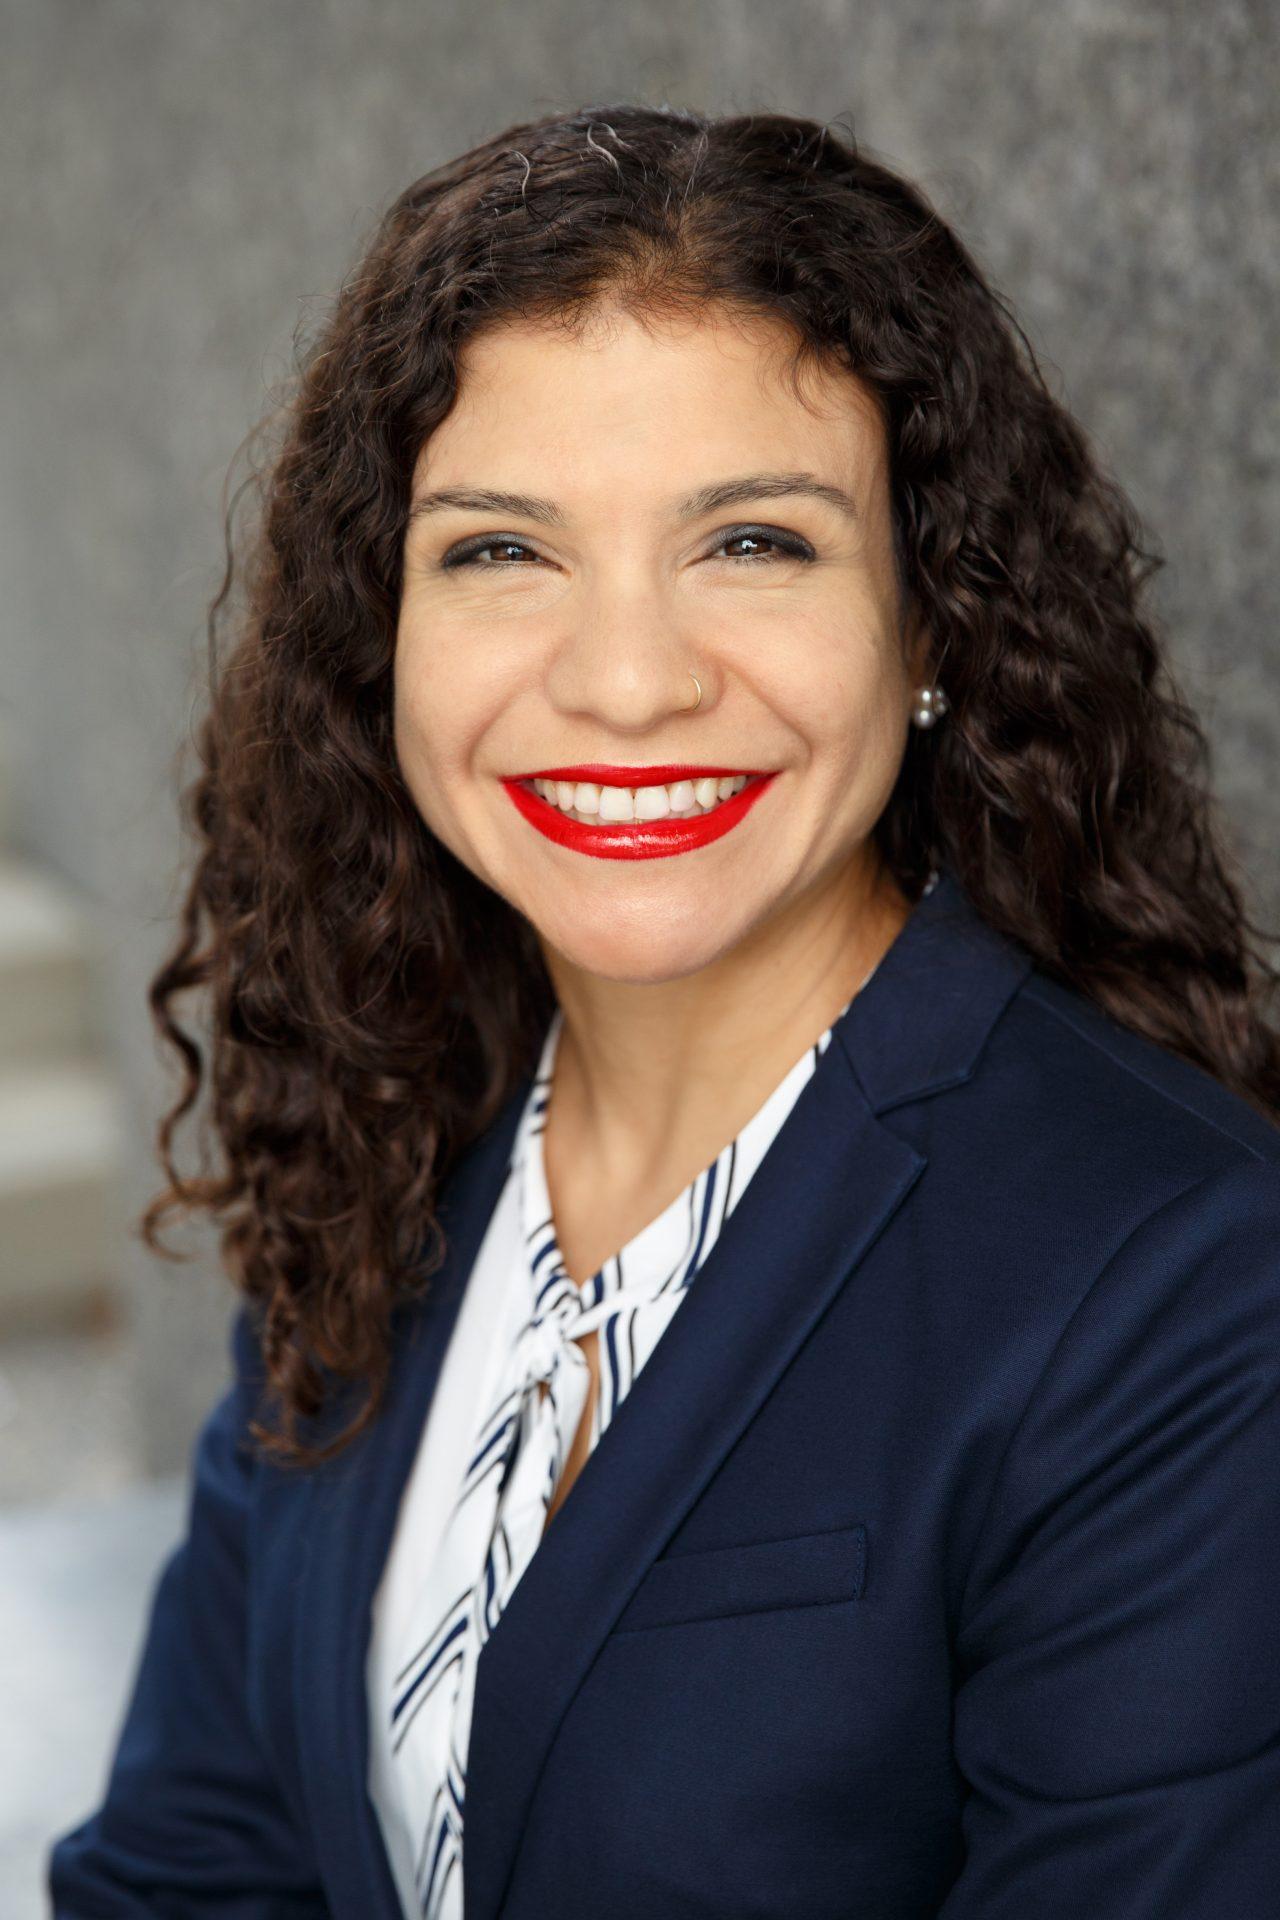 Elisa Batista of Berkeley, California, works to fight sexism through UltraViolet.